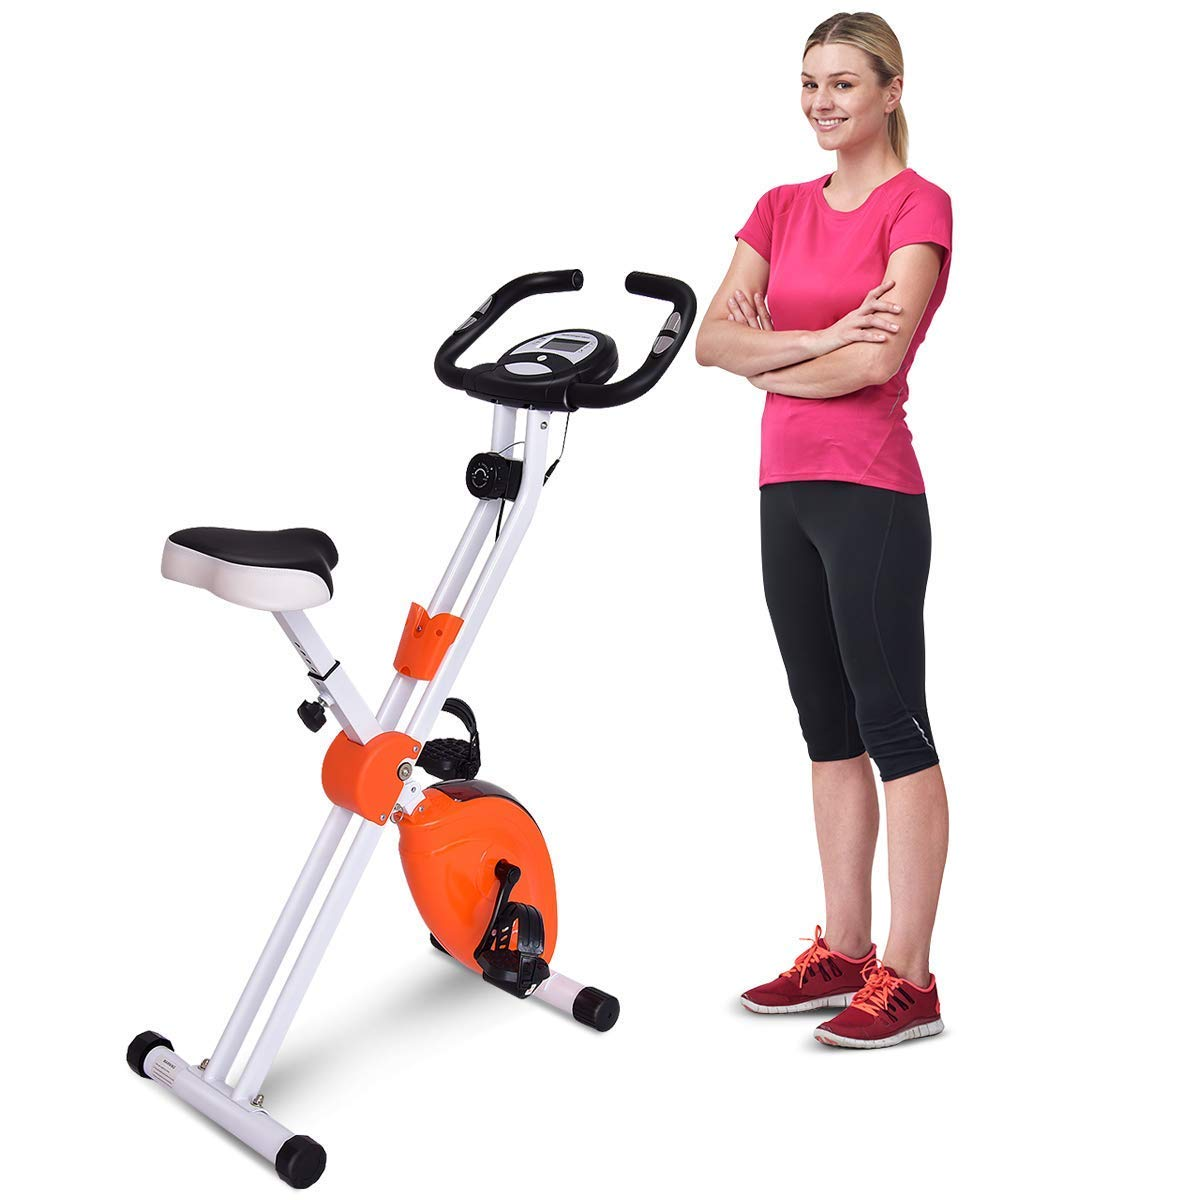 GOPLUS Upright Bike Magnetic Resistance Flywheel Bike Cardio Fitness Bicycle Equipment (Orange)